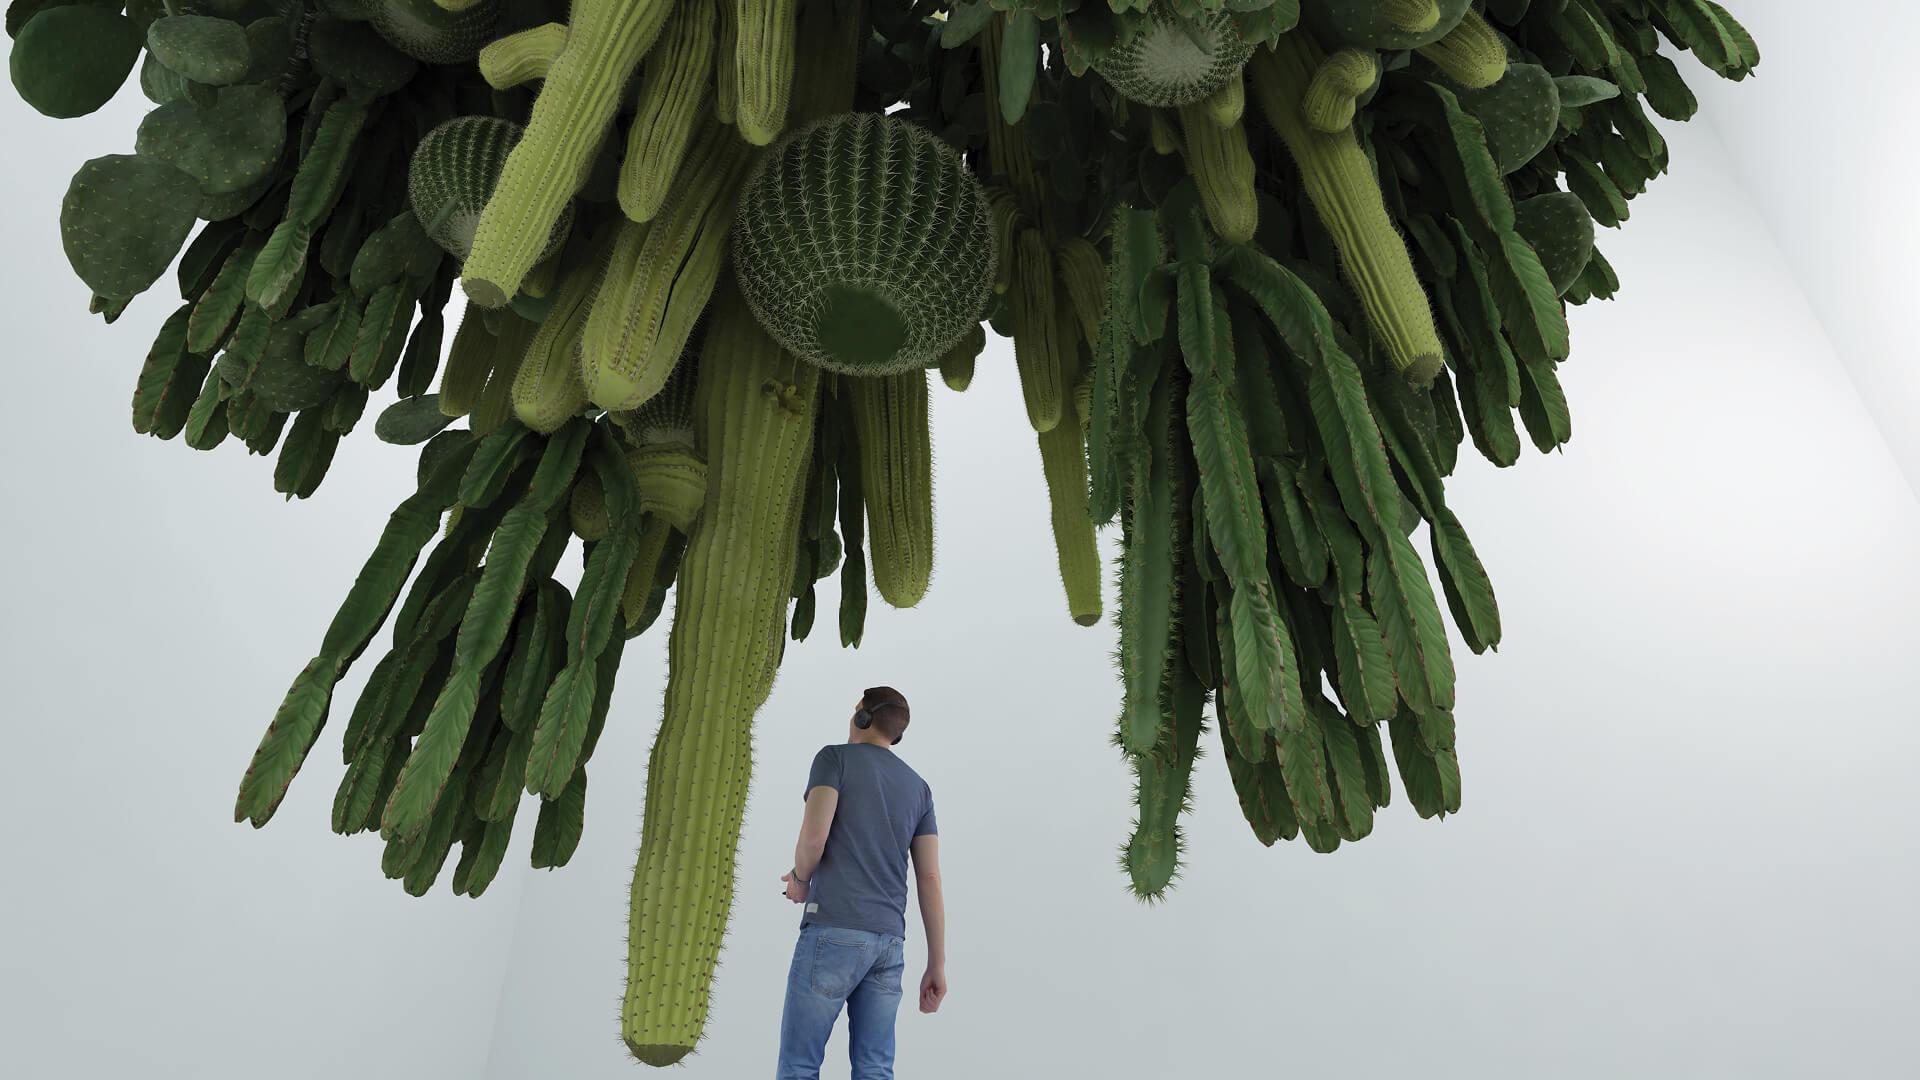 Inverted Cactus | Cyril Lancelin | STIRworld